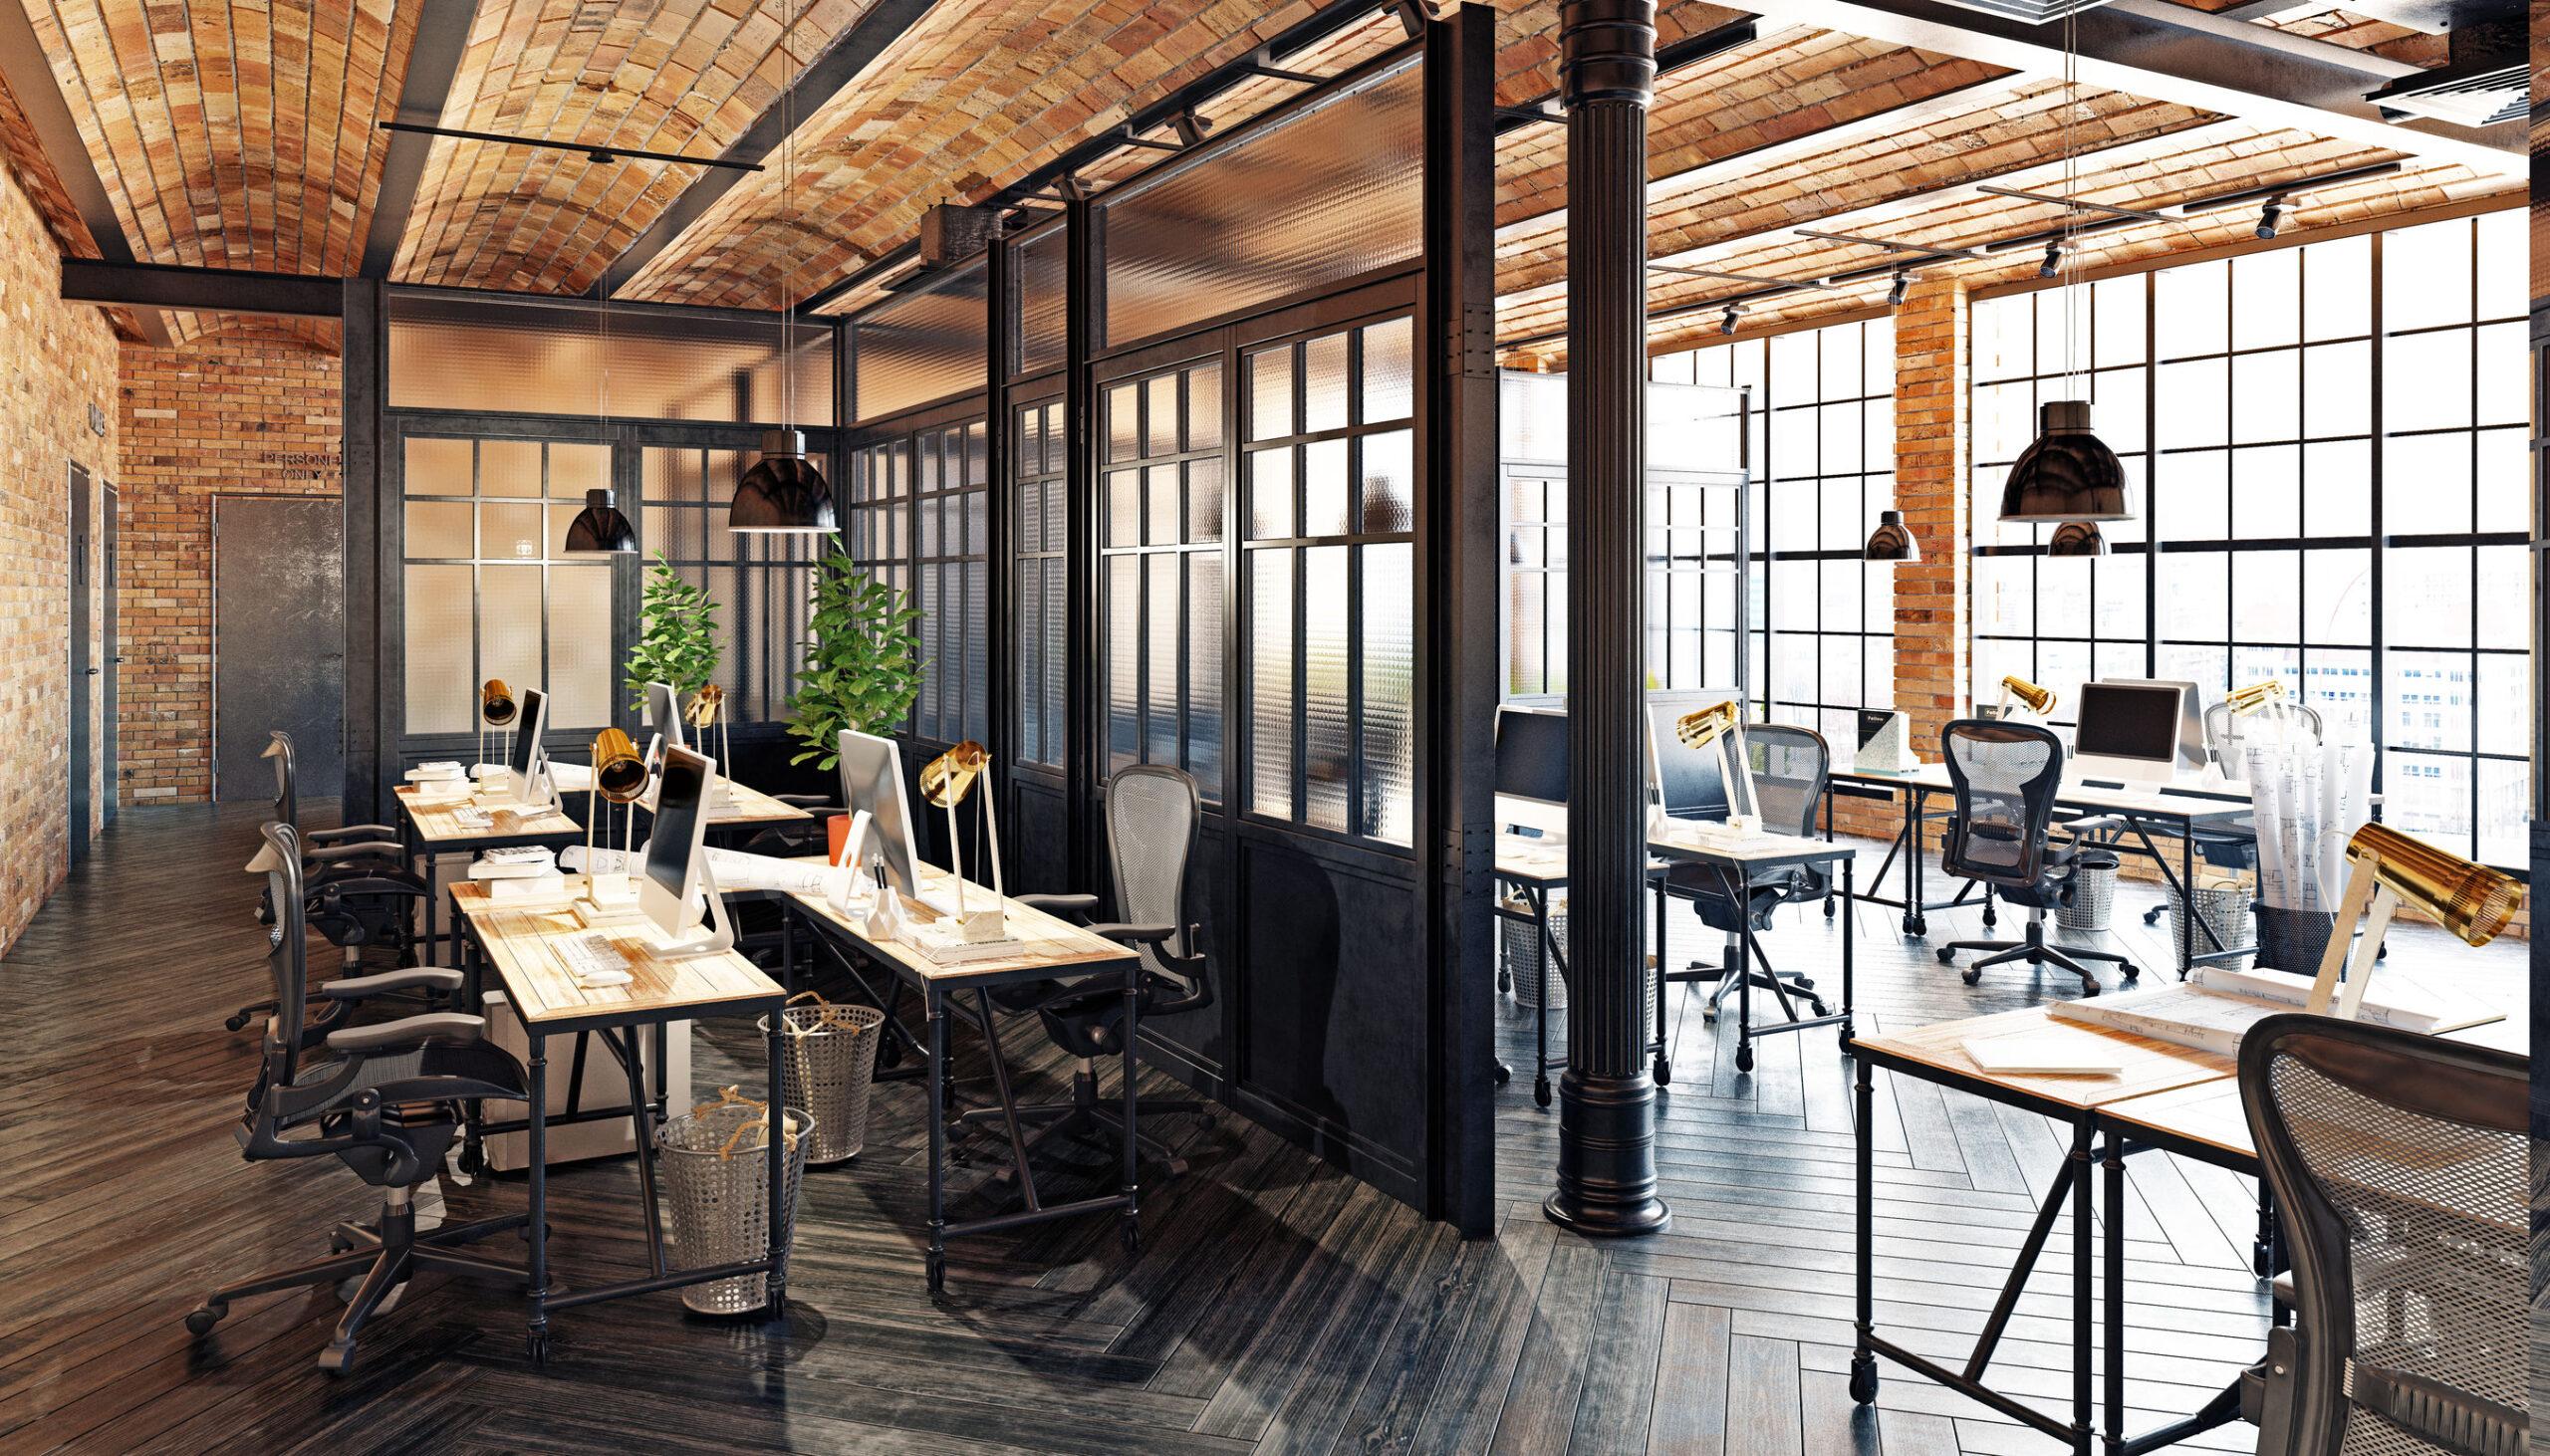 Workspace Cable Management